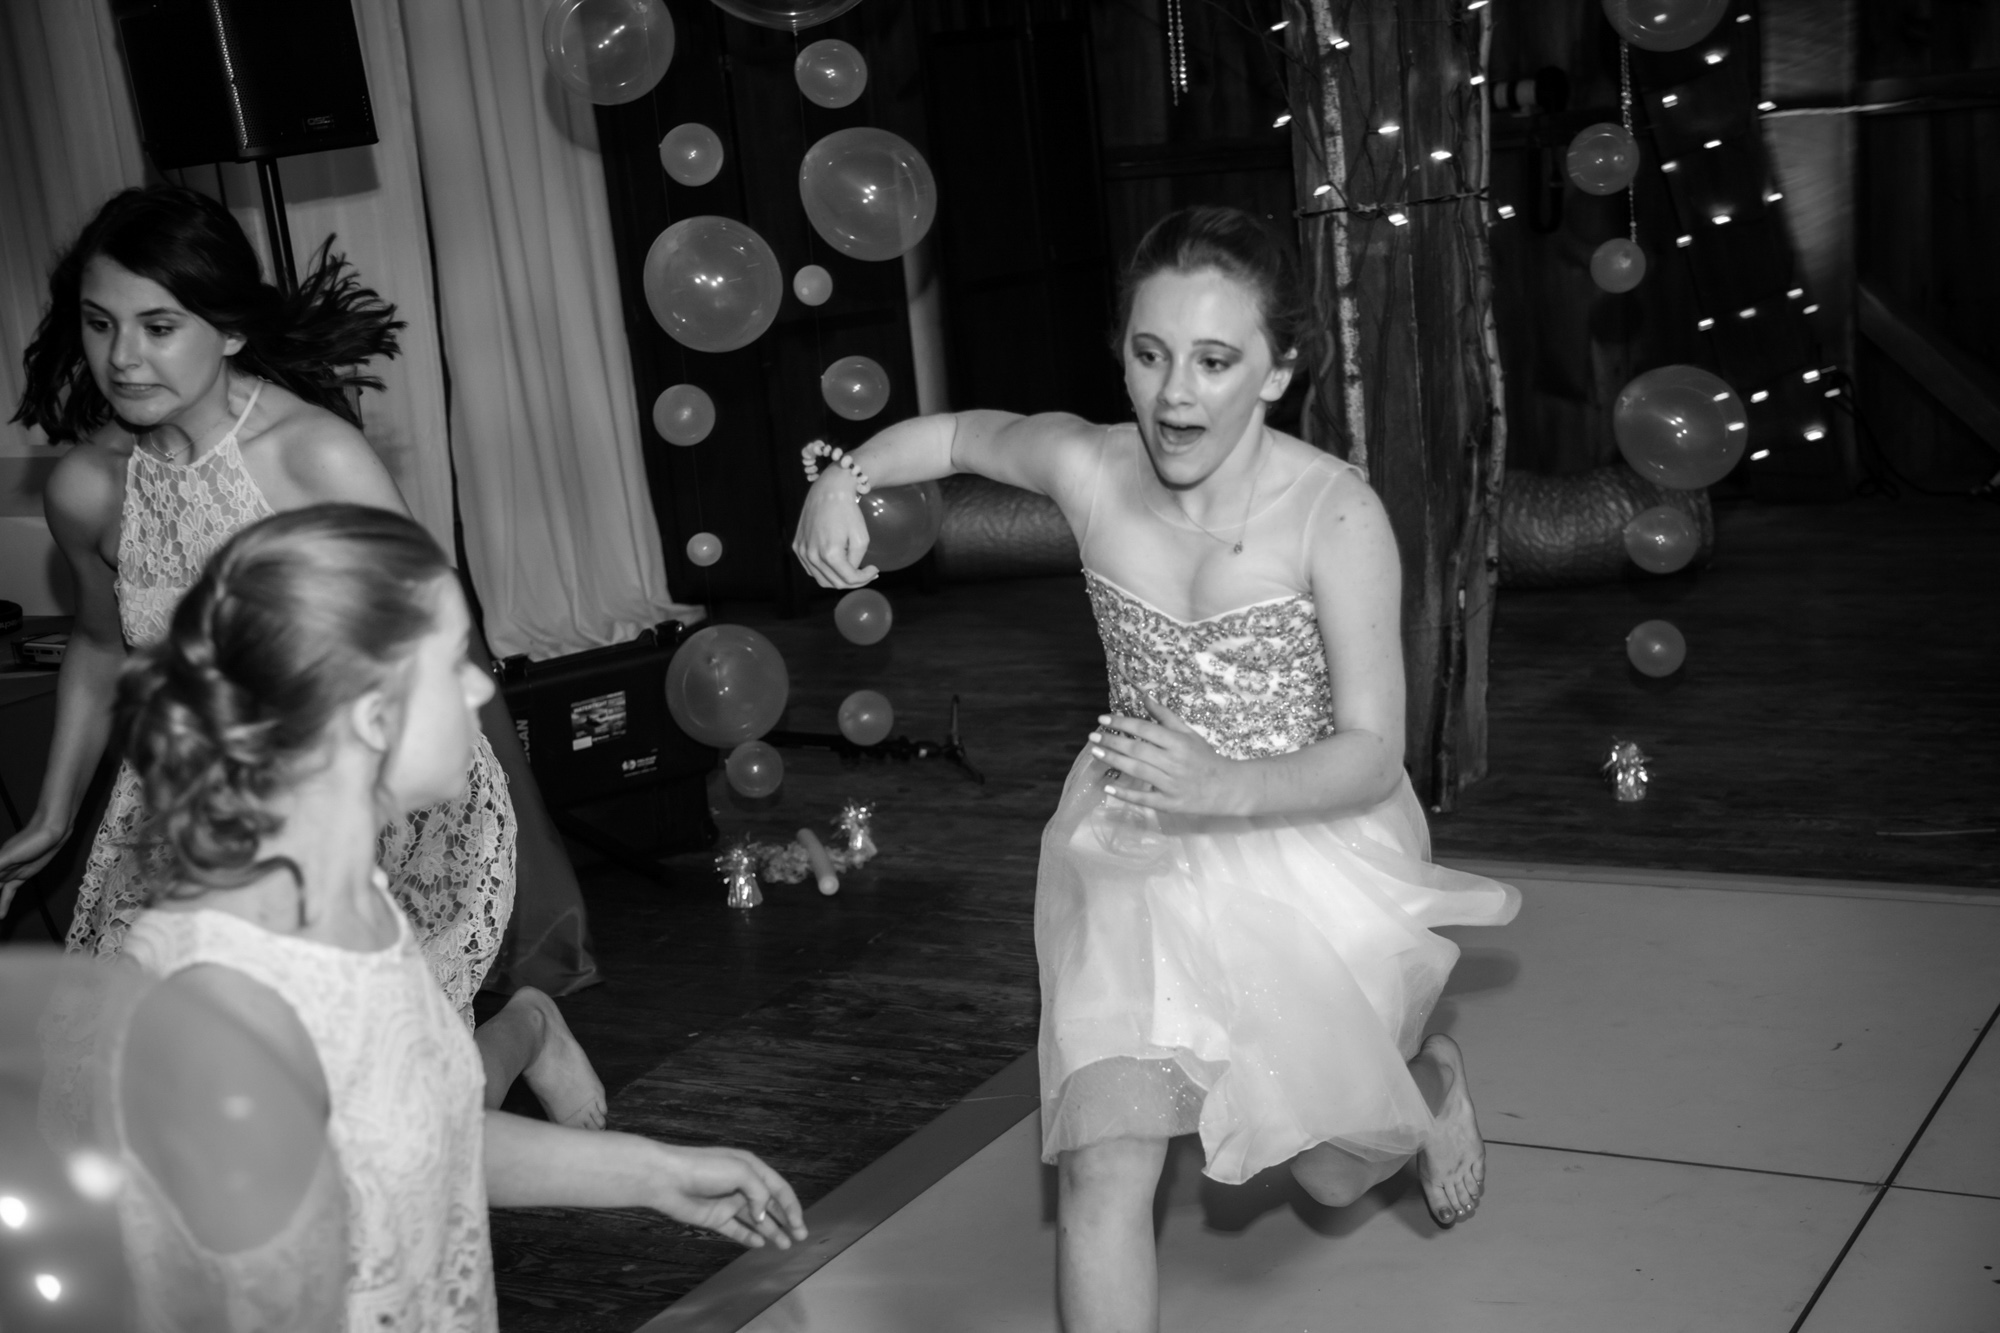 scranton_wedding_photographer_lettieri_pa (22 of 27).jpg